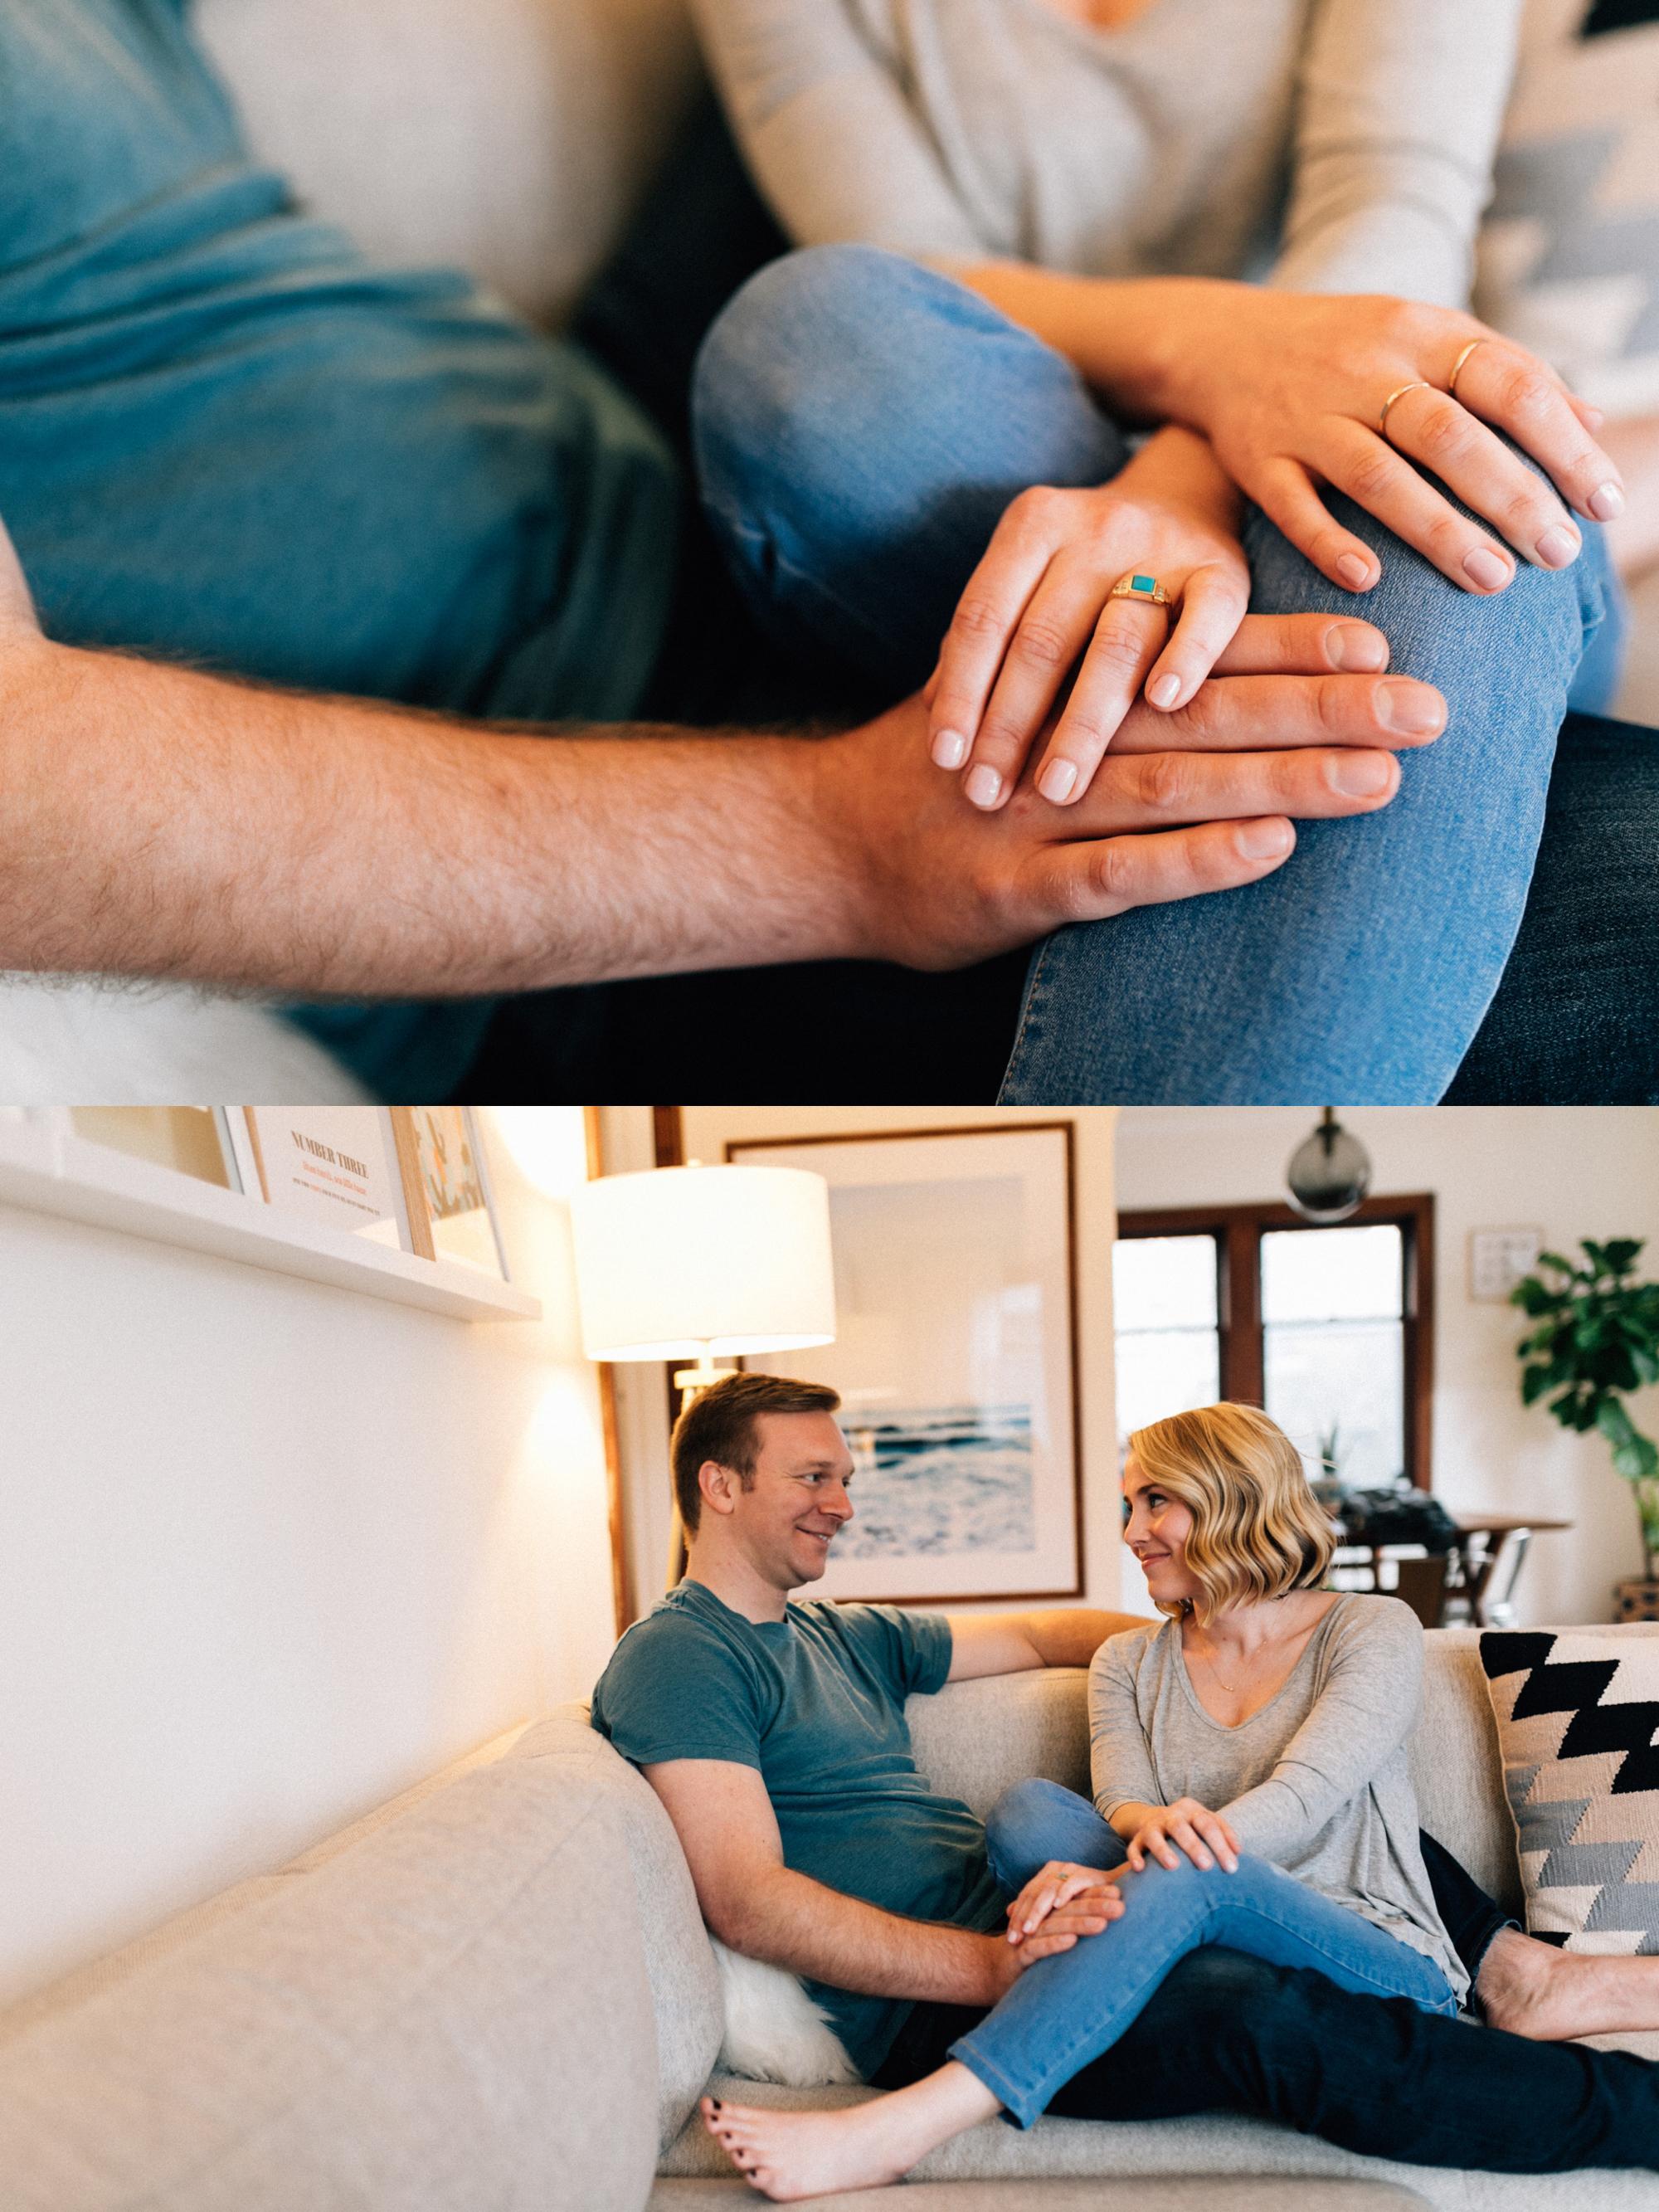 seattle in home engagement lifestyle couples photos wedding photographer washington pnw-6.jpg